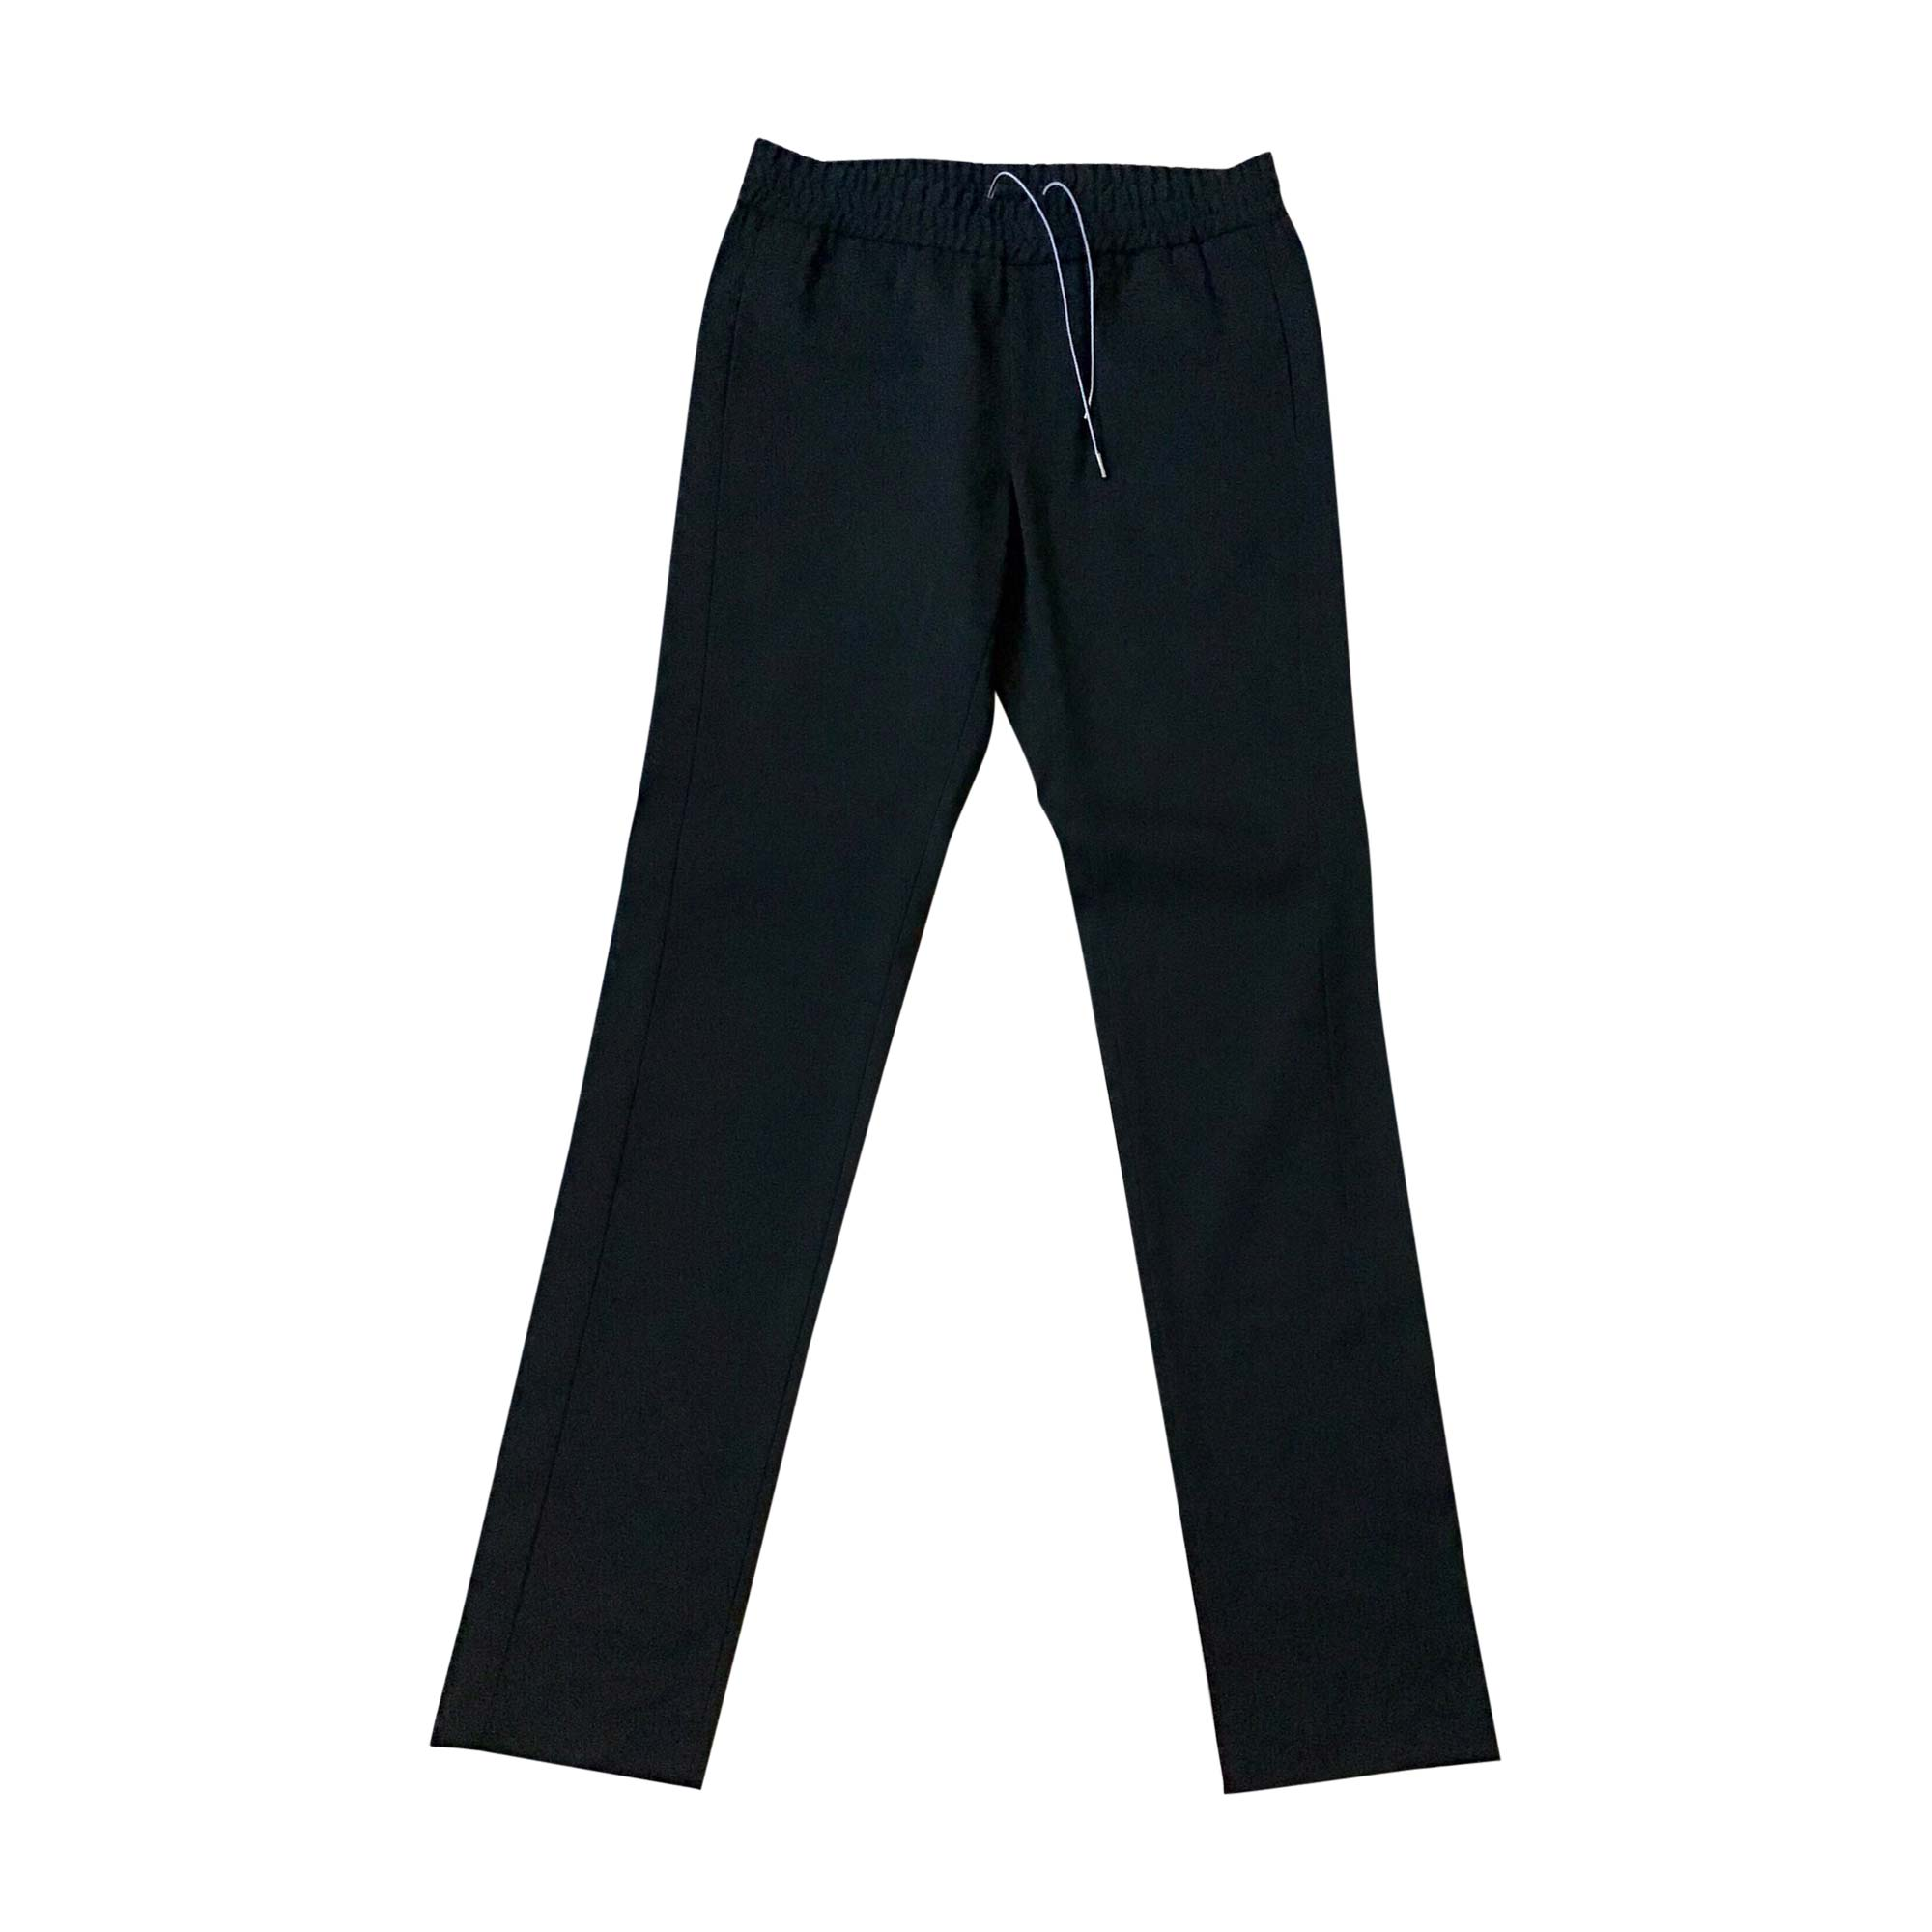 Pantalon droit EMPORIO ARMANI Noir